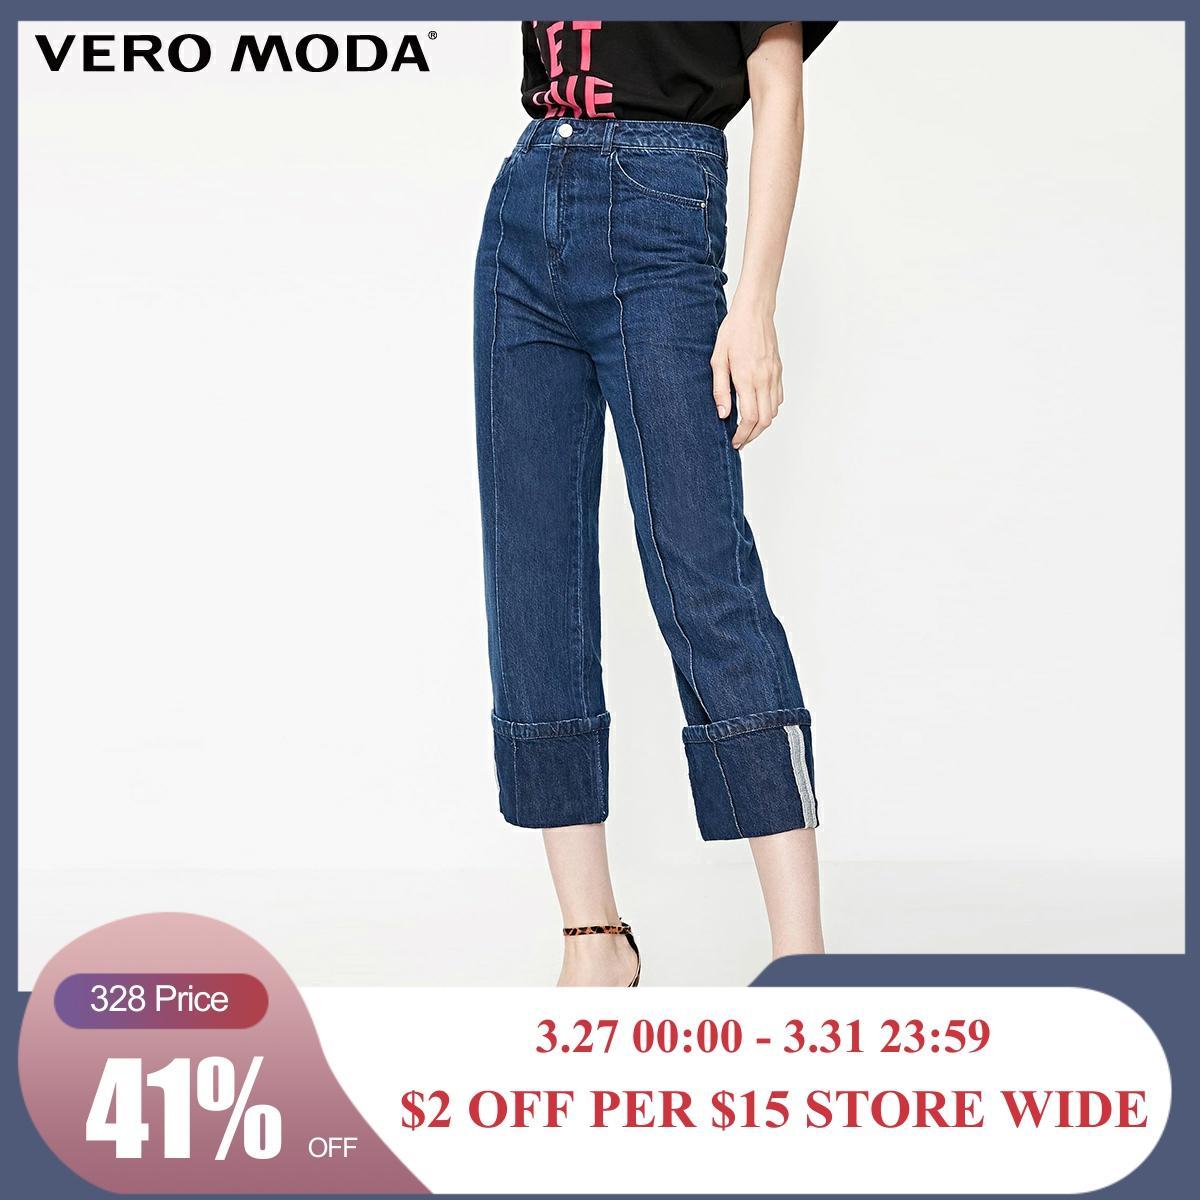 Vero Moda Women's 100% Cotton Rolled Wide-leg Jeans  | 31926I538